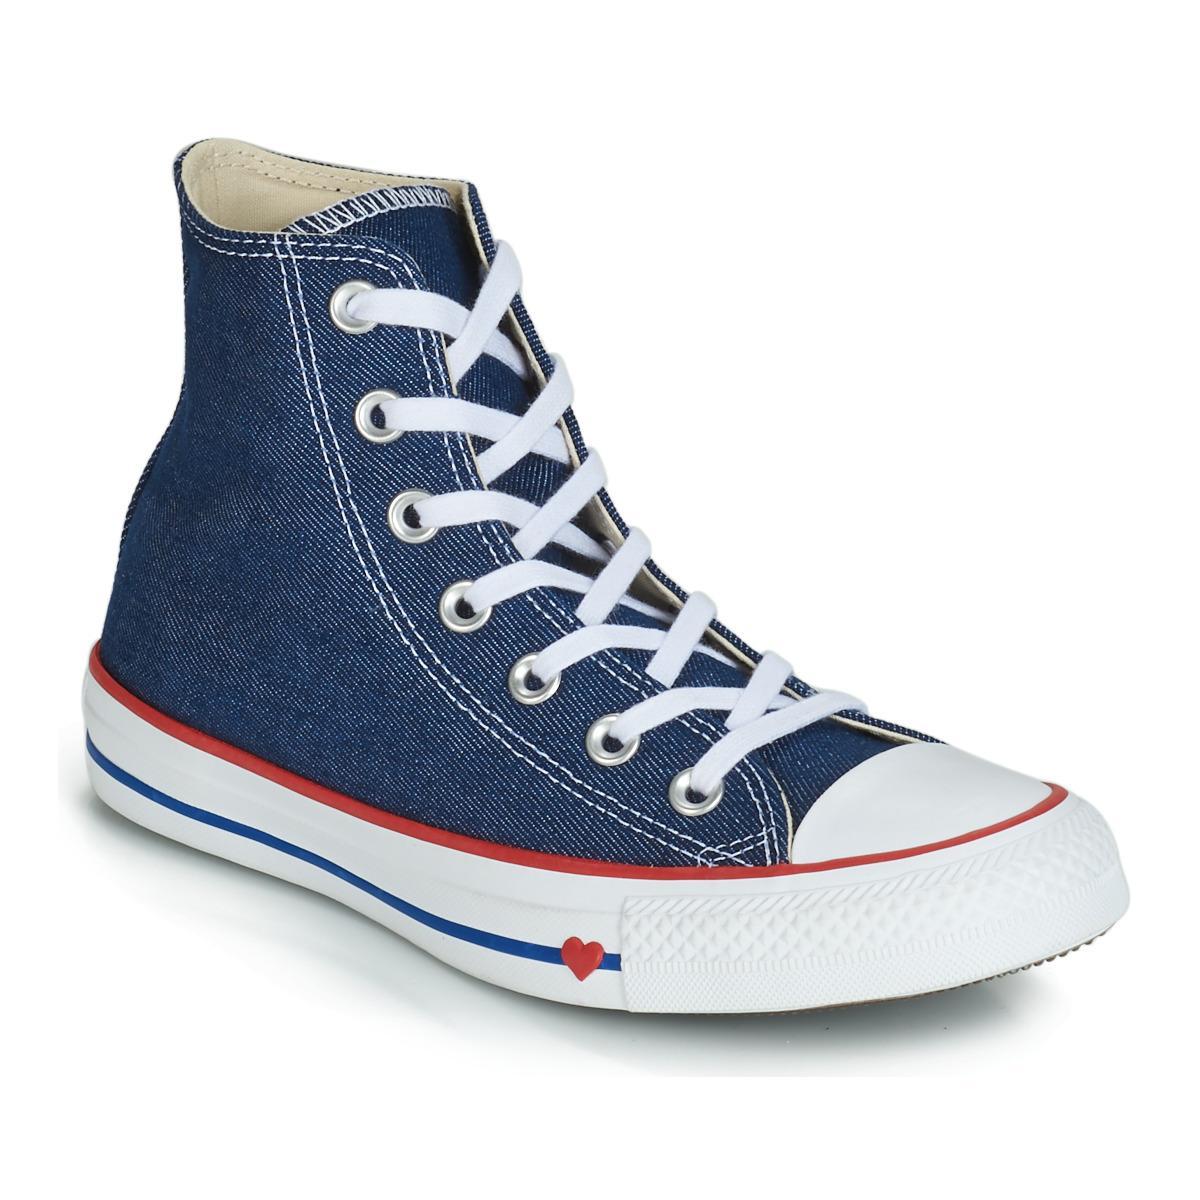 e5c30a9f9236 Converse. Women s Blue Chuck Taylor All Star Sucker For Love Textile Hi  Shoes ...